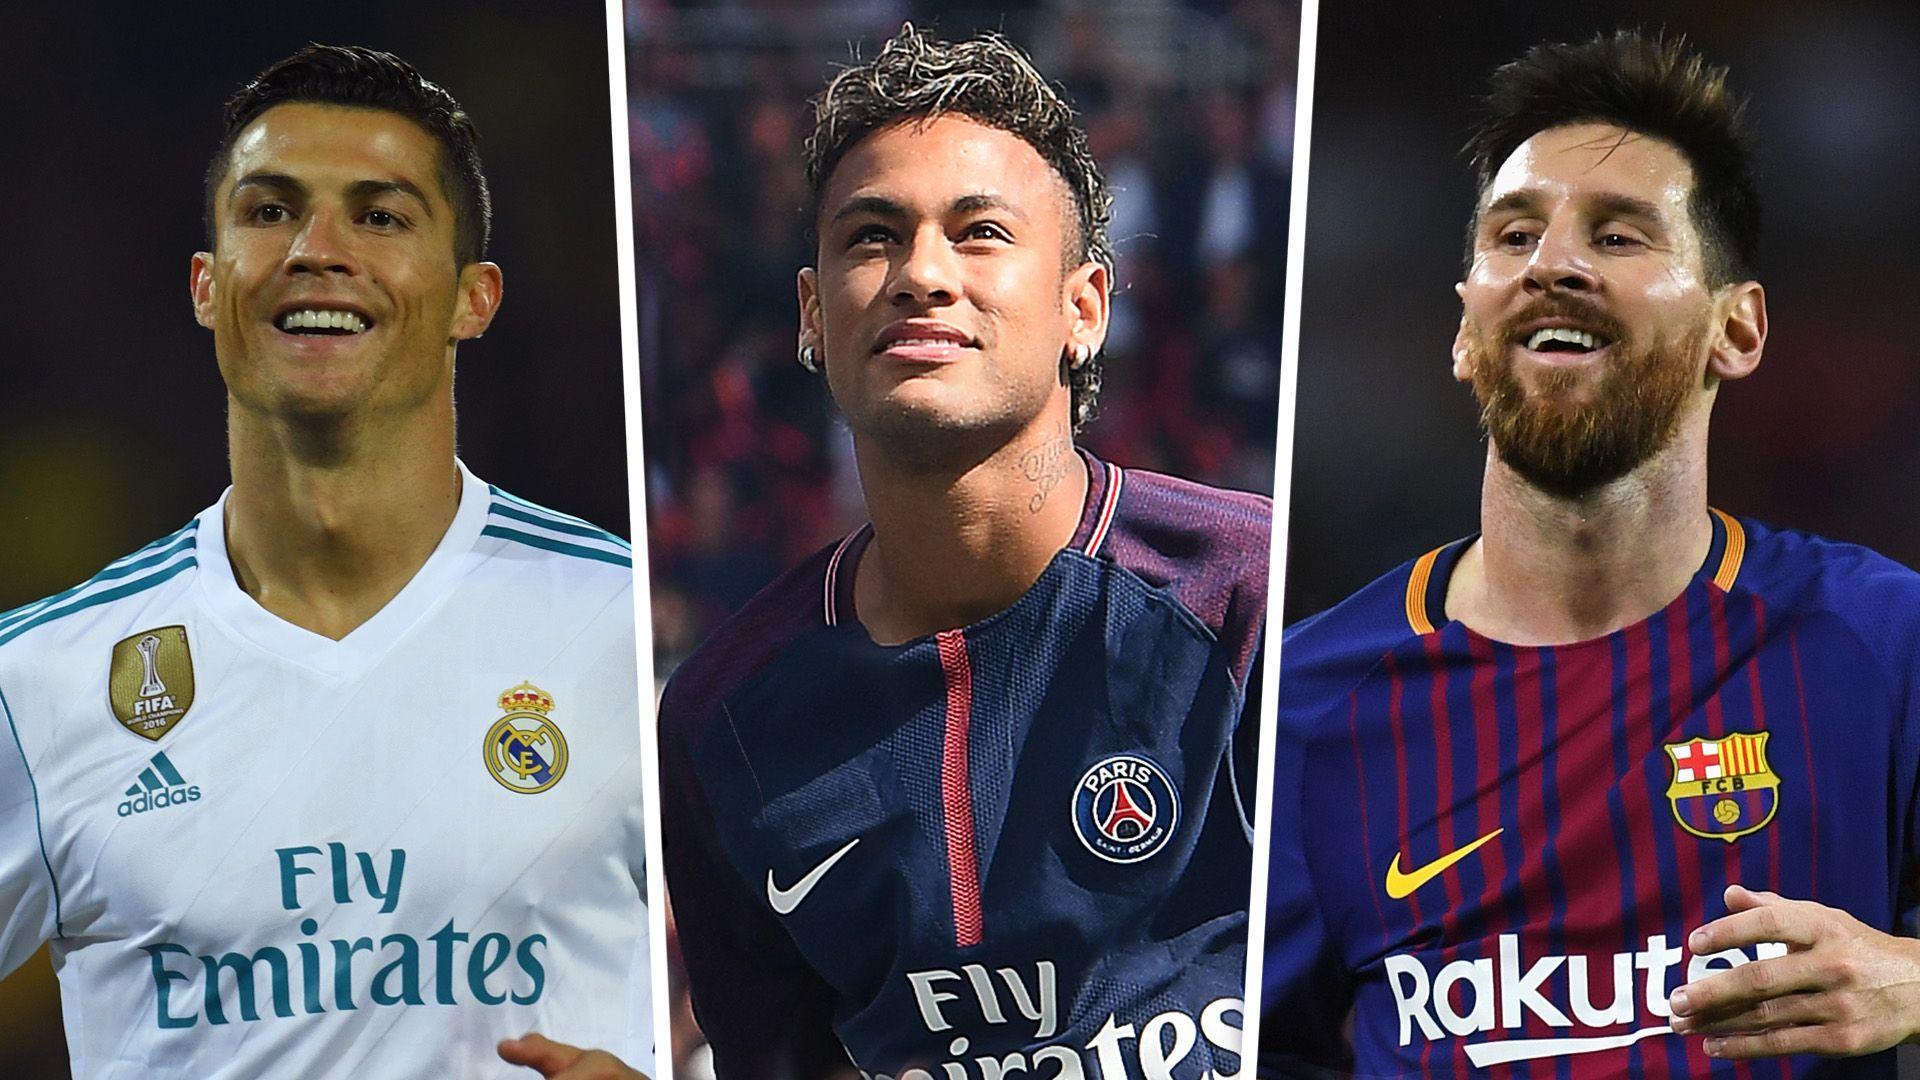 Pele Thinks Psg Star Neymar Is More Similar To Lionel Messi